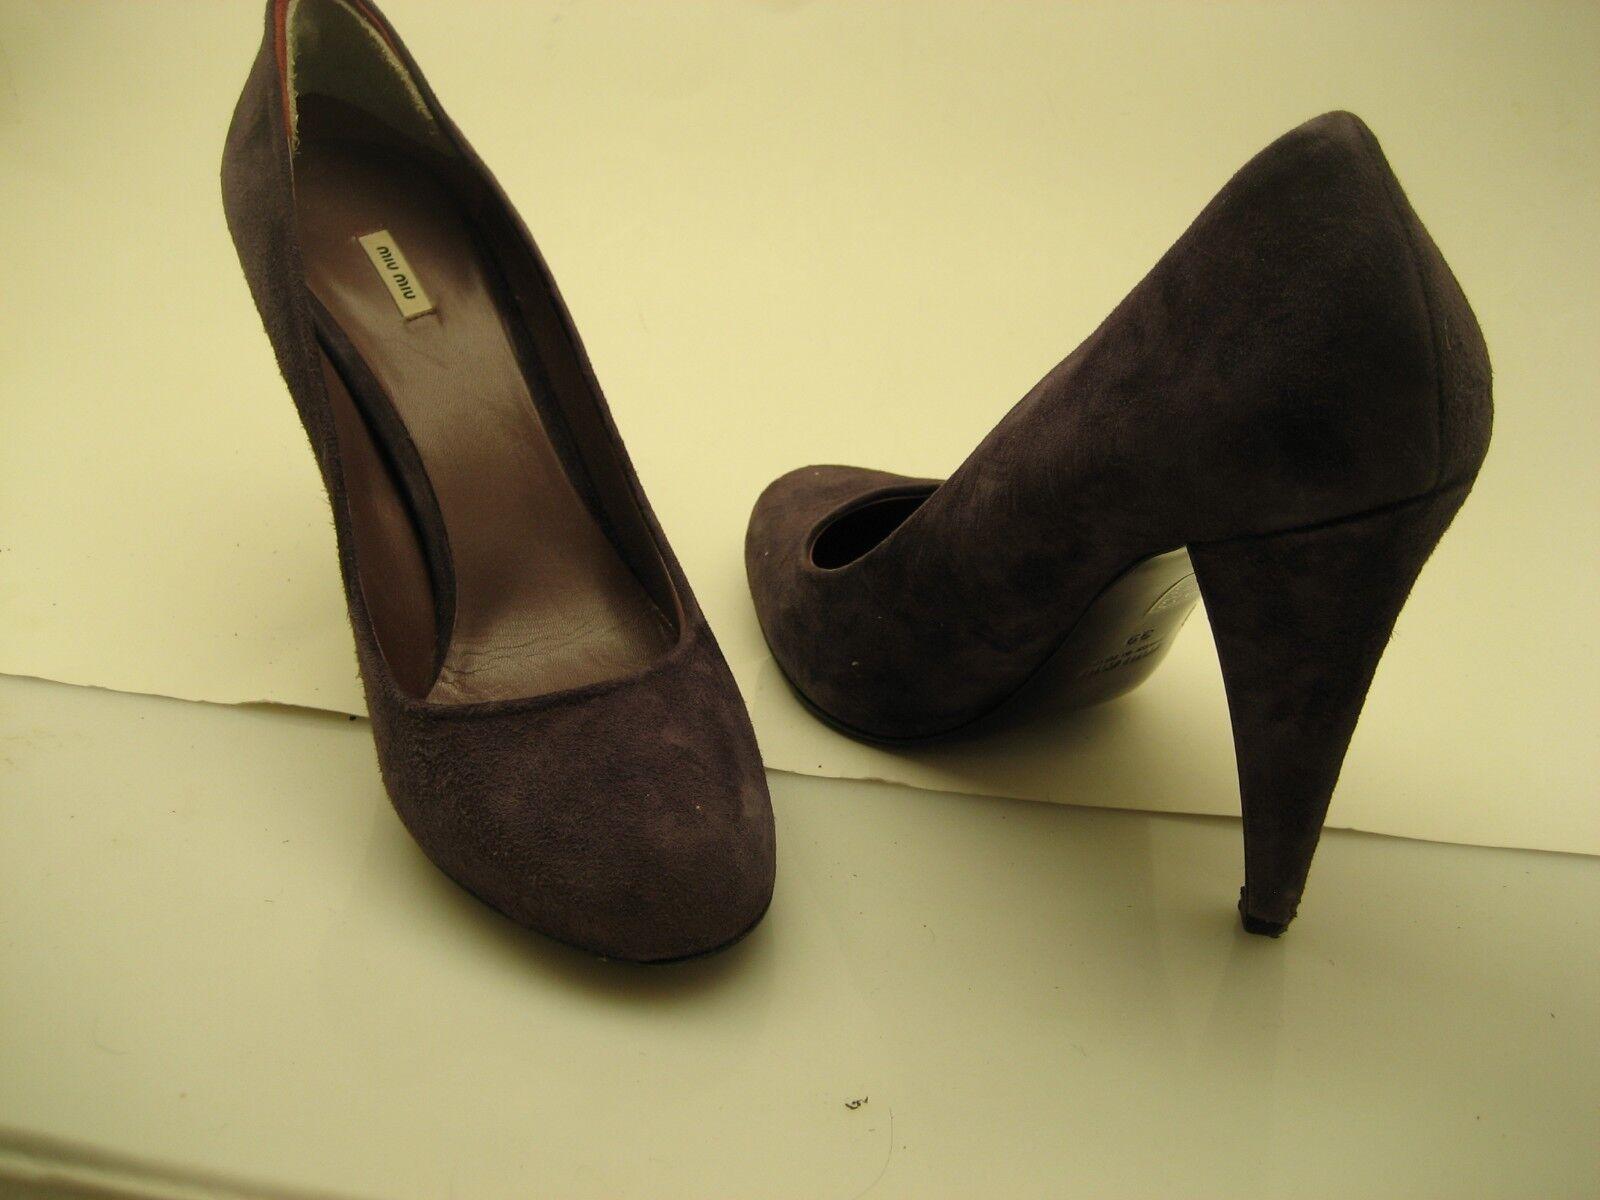 fantastica qualità donna Miu Miu heels made in    Dimensione 39 Lavender slipon  la migliore moda